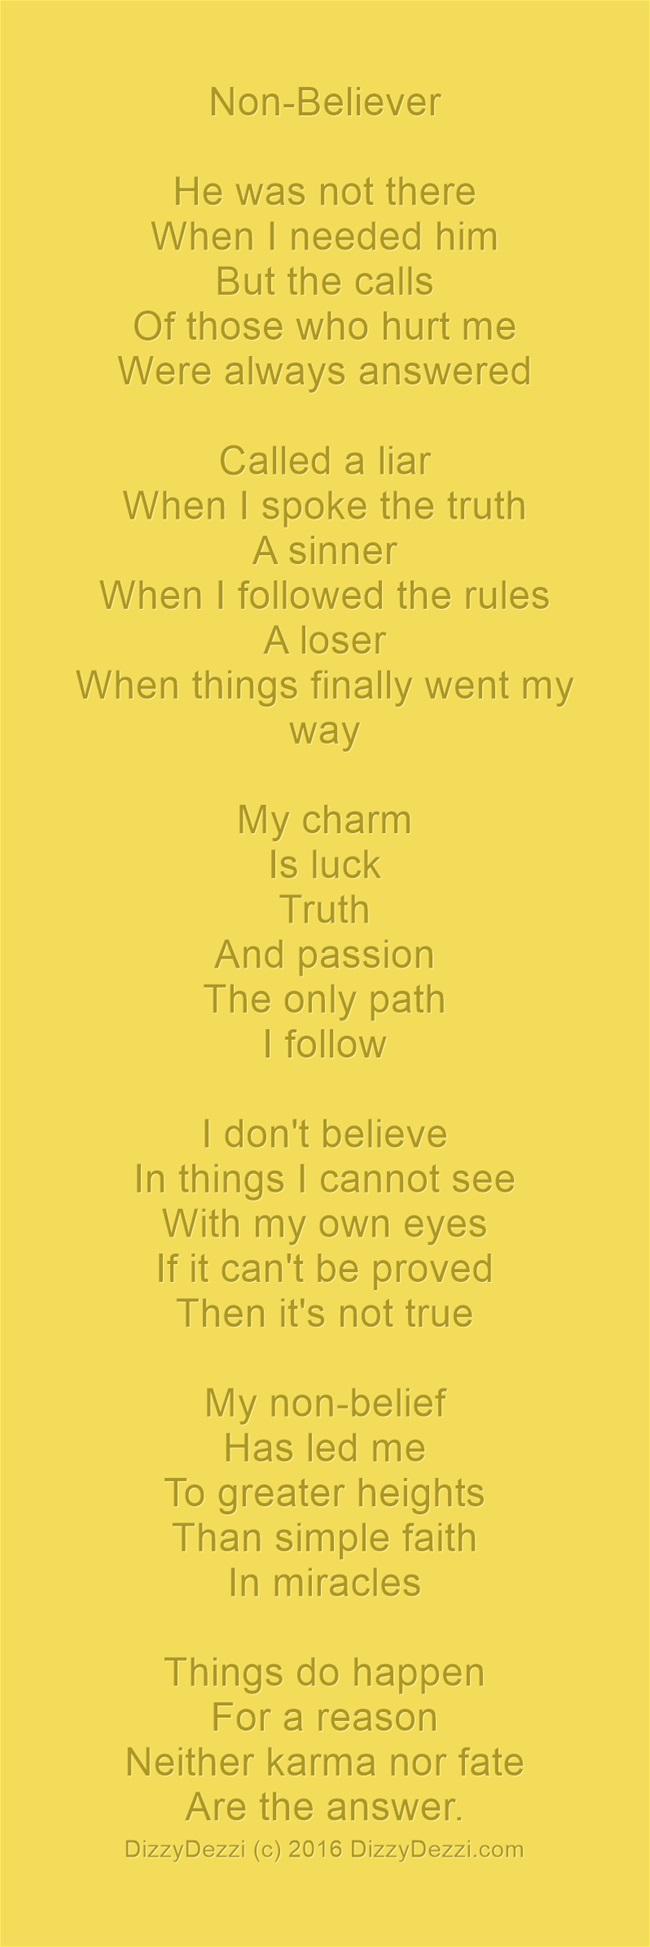 Non-Believer: A poem